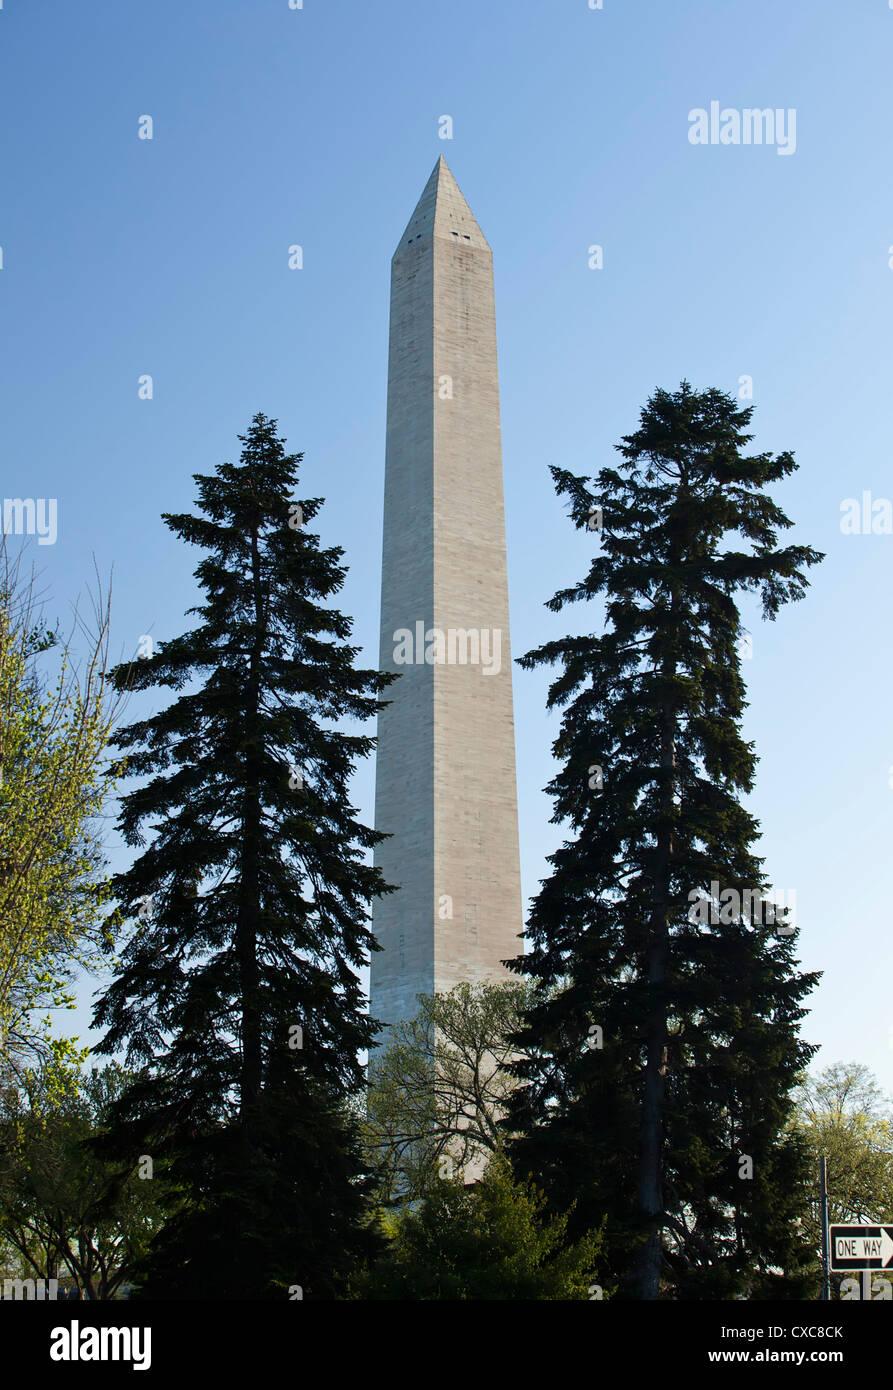 Das Washington Monument, Washington D.C., Vereinigte Staaten von Amerika, Nordamerika Stockbild